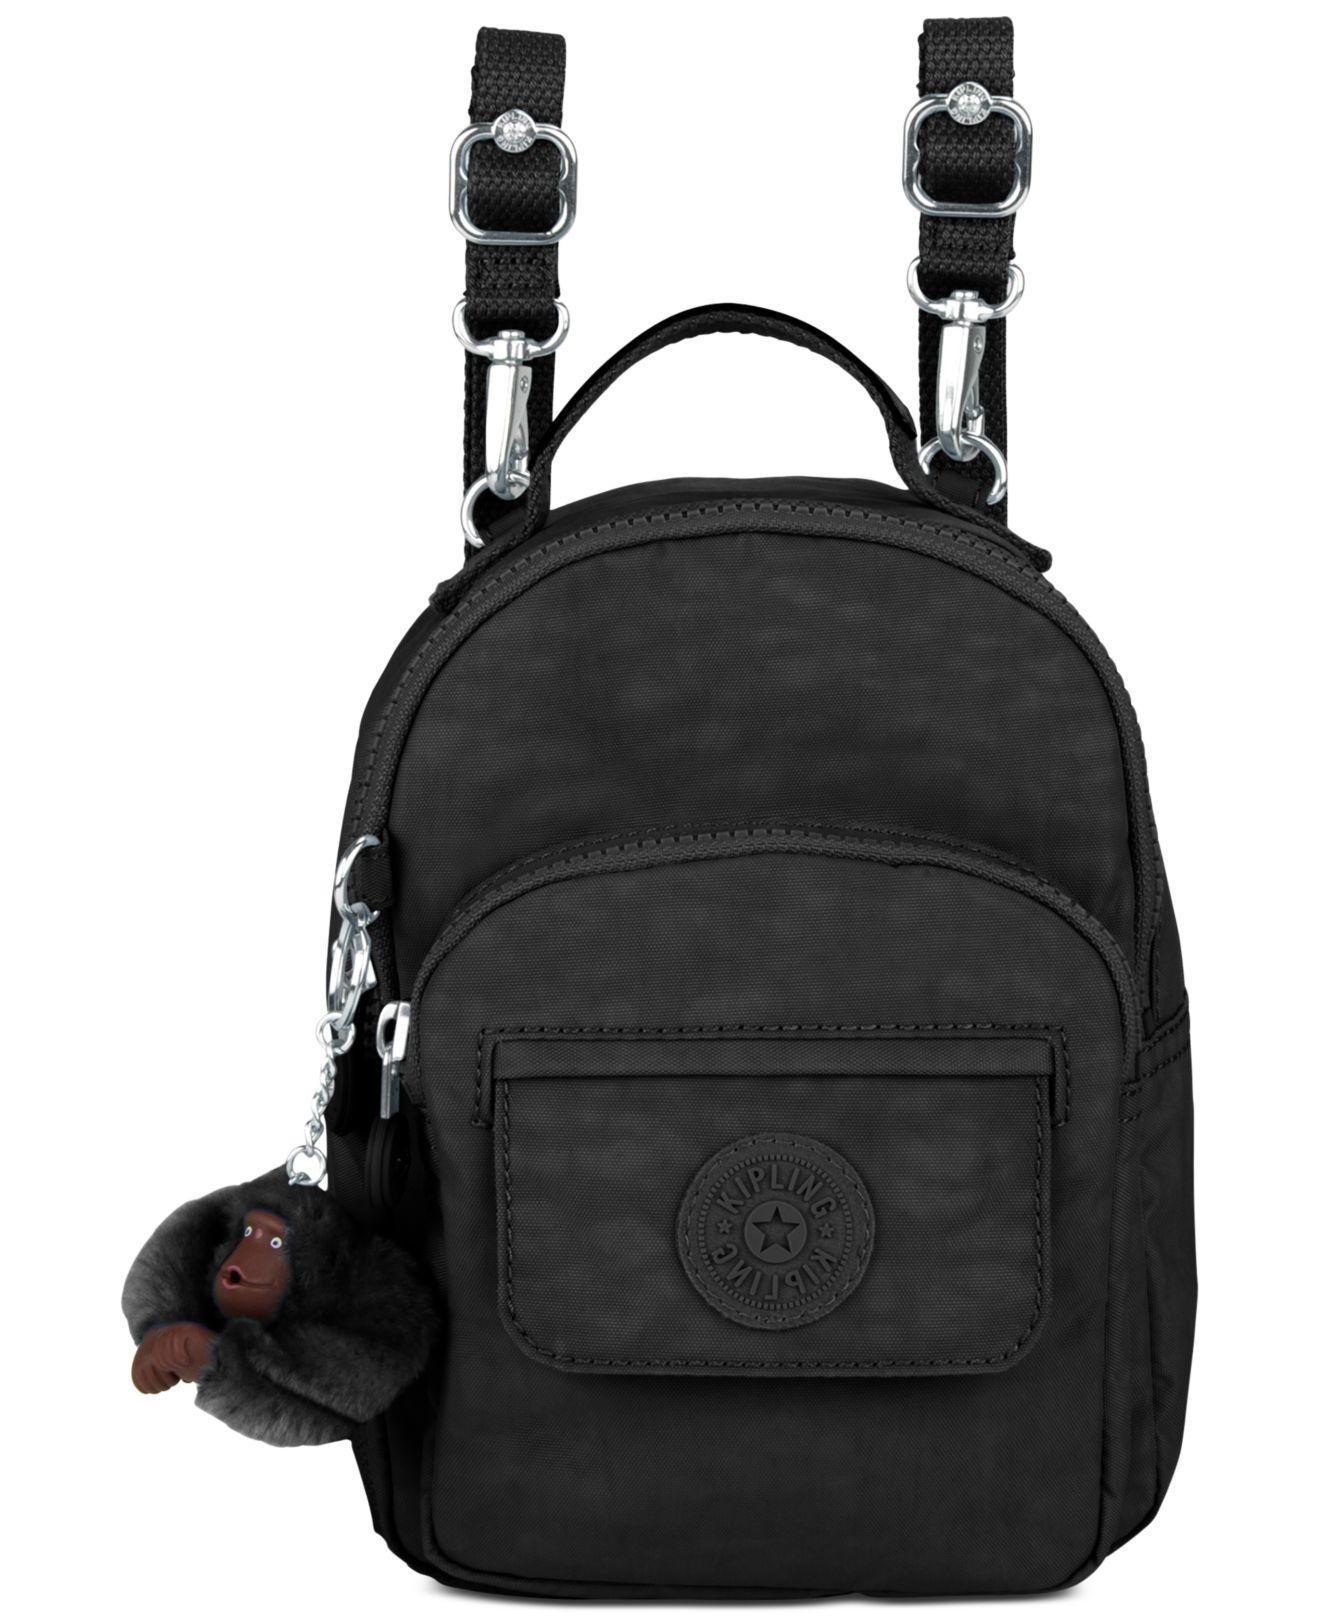 99b2b5a275 Lyst - Kipling Alber 3-in-1 Convertible Mini Bag Backpack in Black